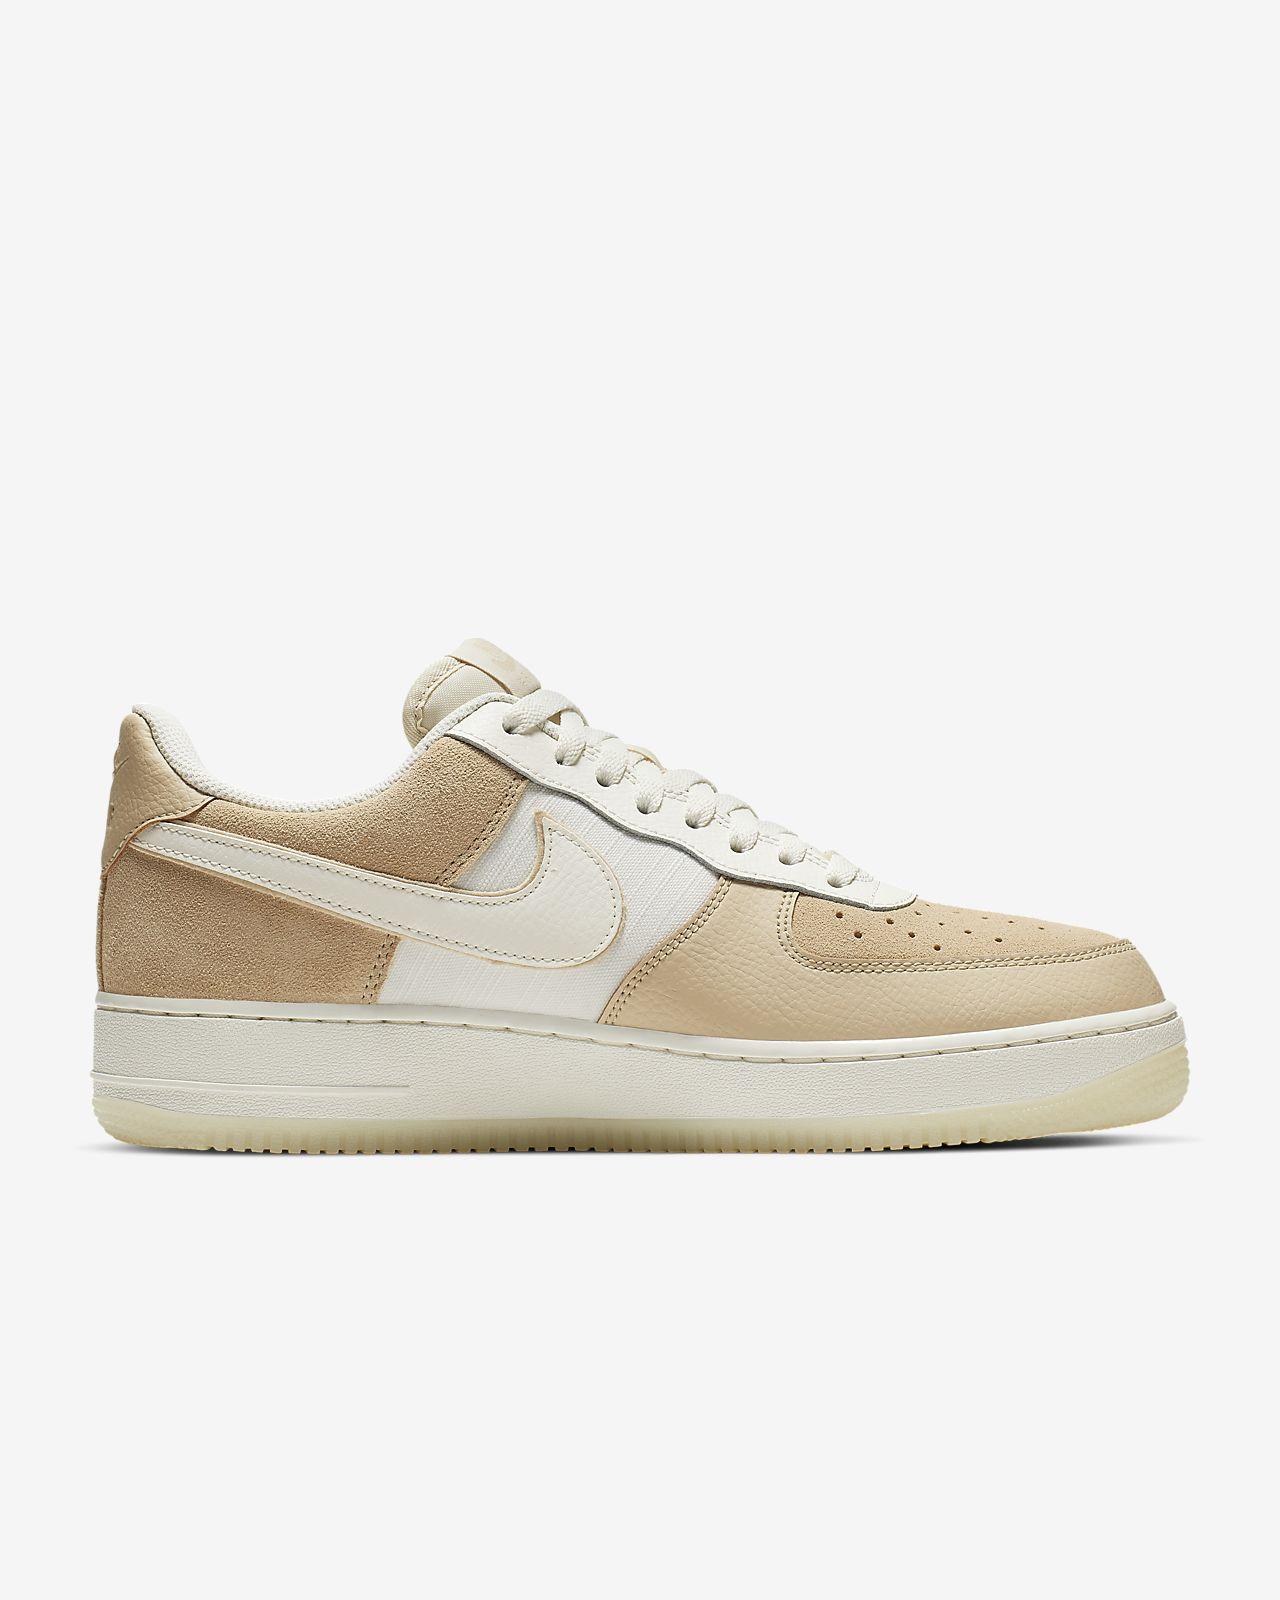 innovative design e4fb0 ebf4c ... Nike Air Force 1  07 LV8 2 Men s Shoe